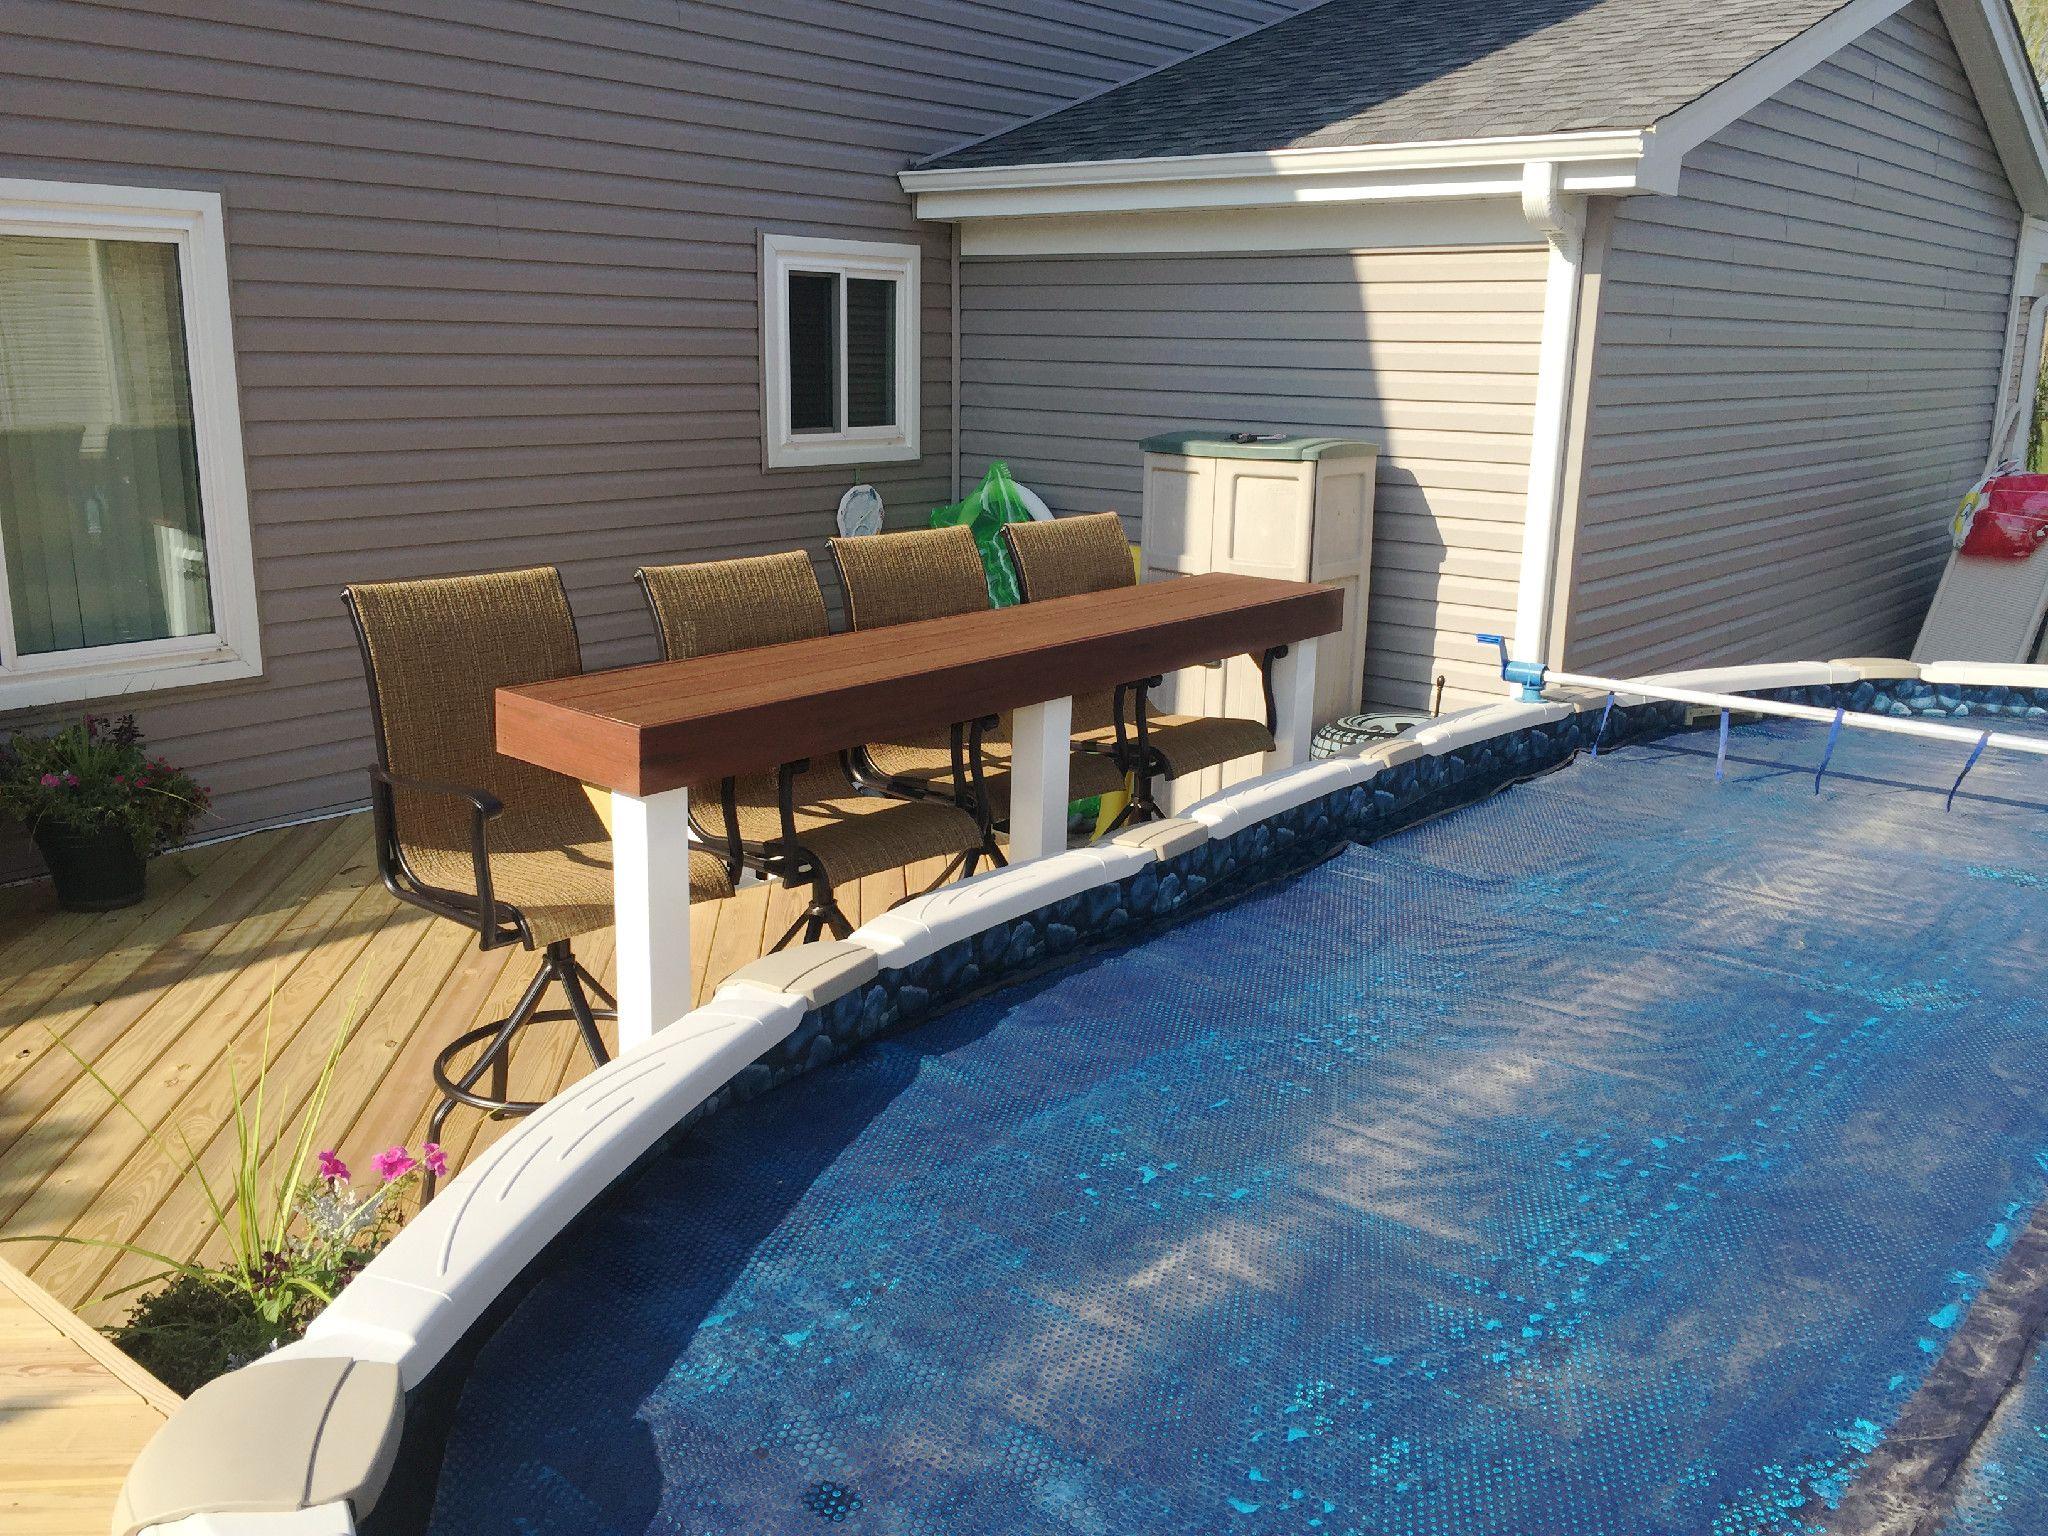 Pool Deck Design With Bar By Aurora Il Deck Builder Deck